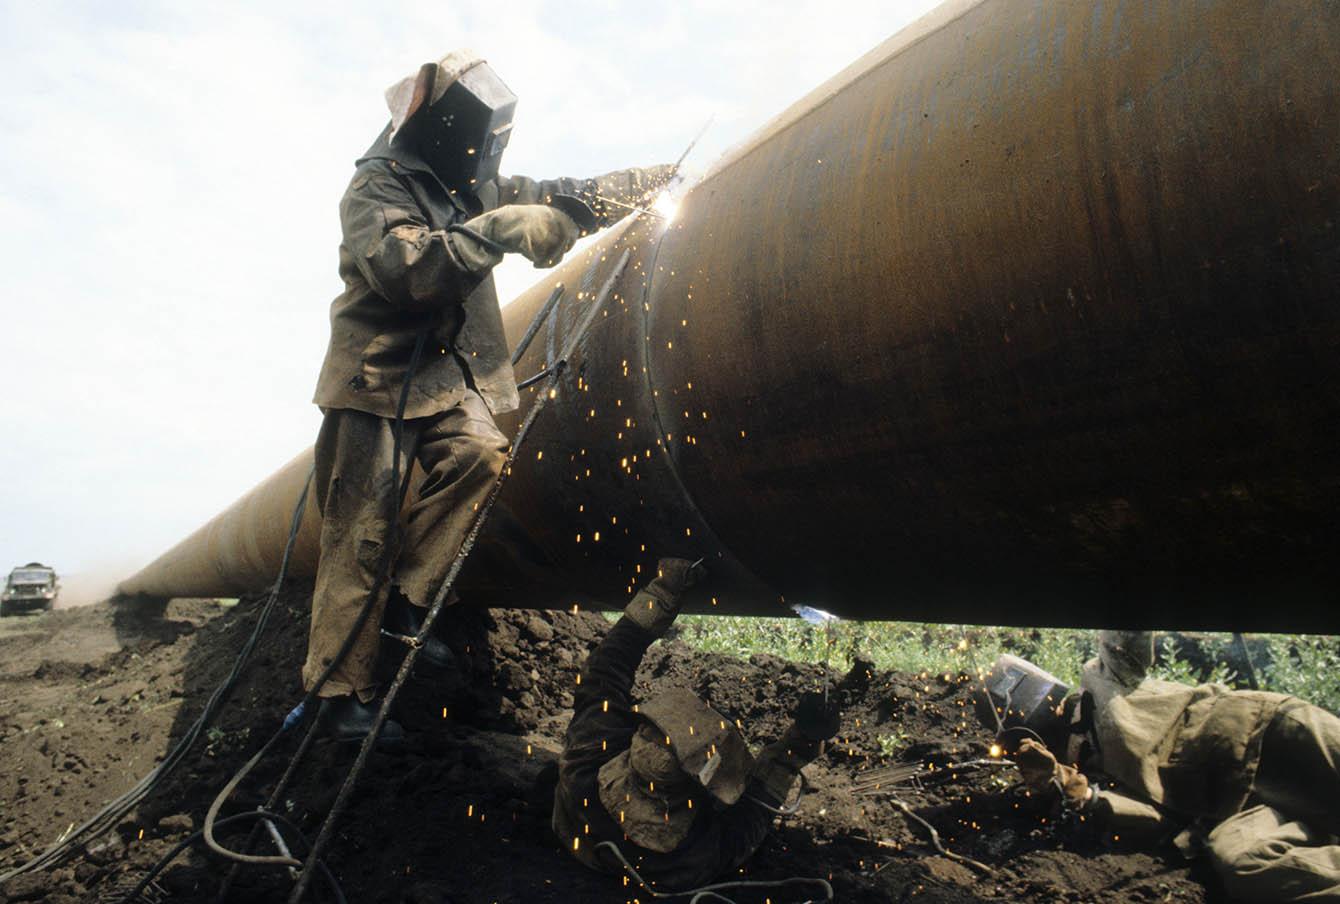 Сварка газопровода в Башкирии, 1982 год.